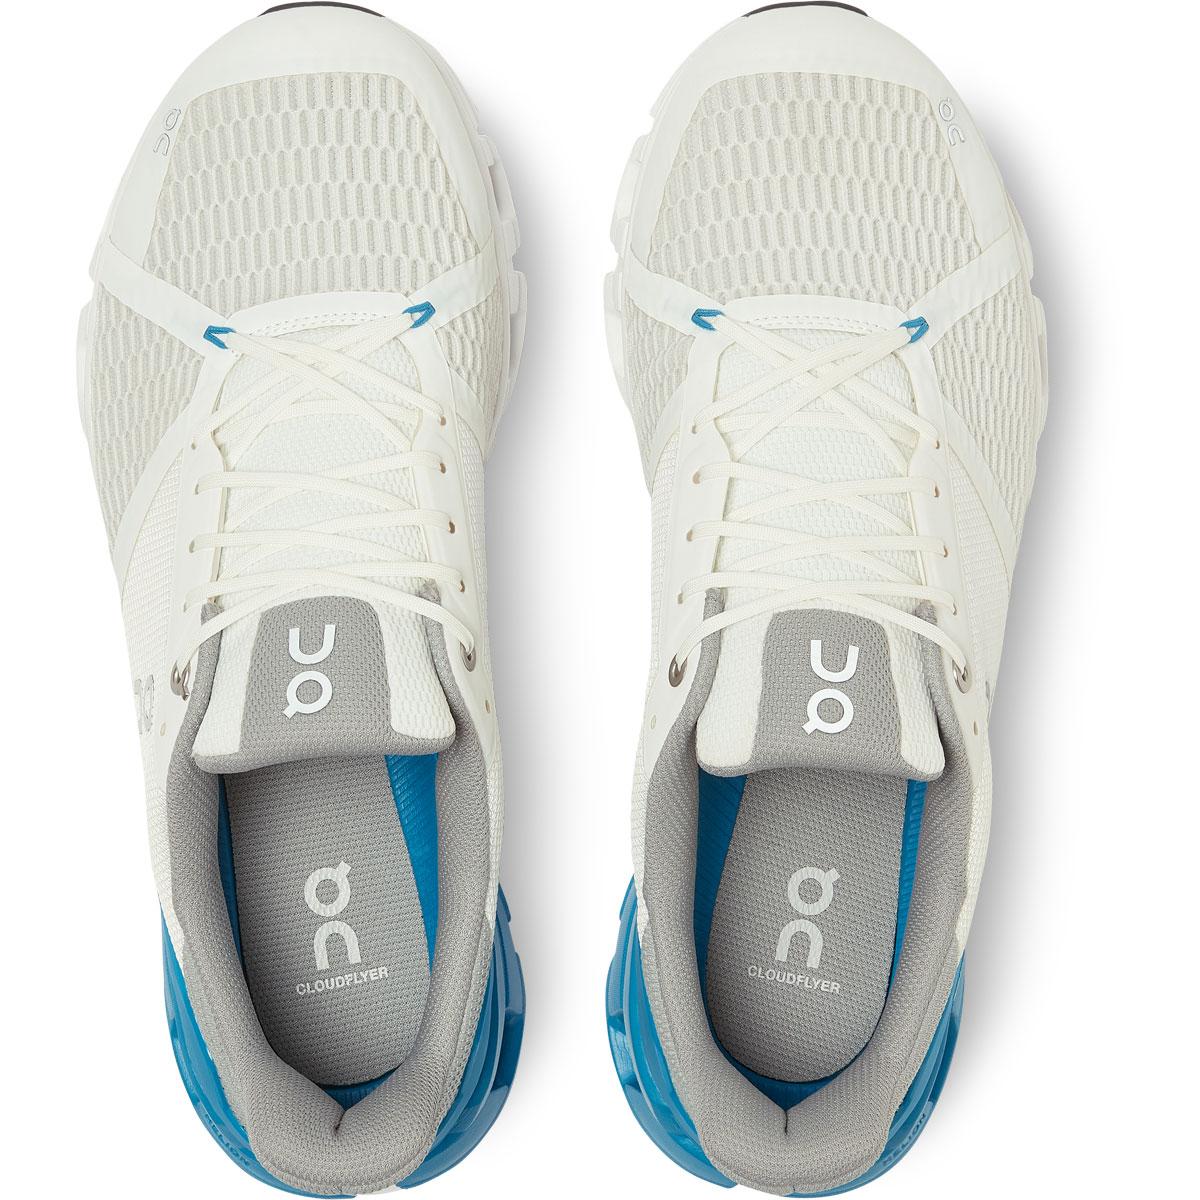 Men's On Cloudflyer 2.0 Running Shoe - Color: White/Blue - Size: 7 - Width: Regular, White/Blue, large, image 4